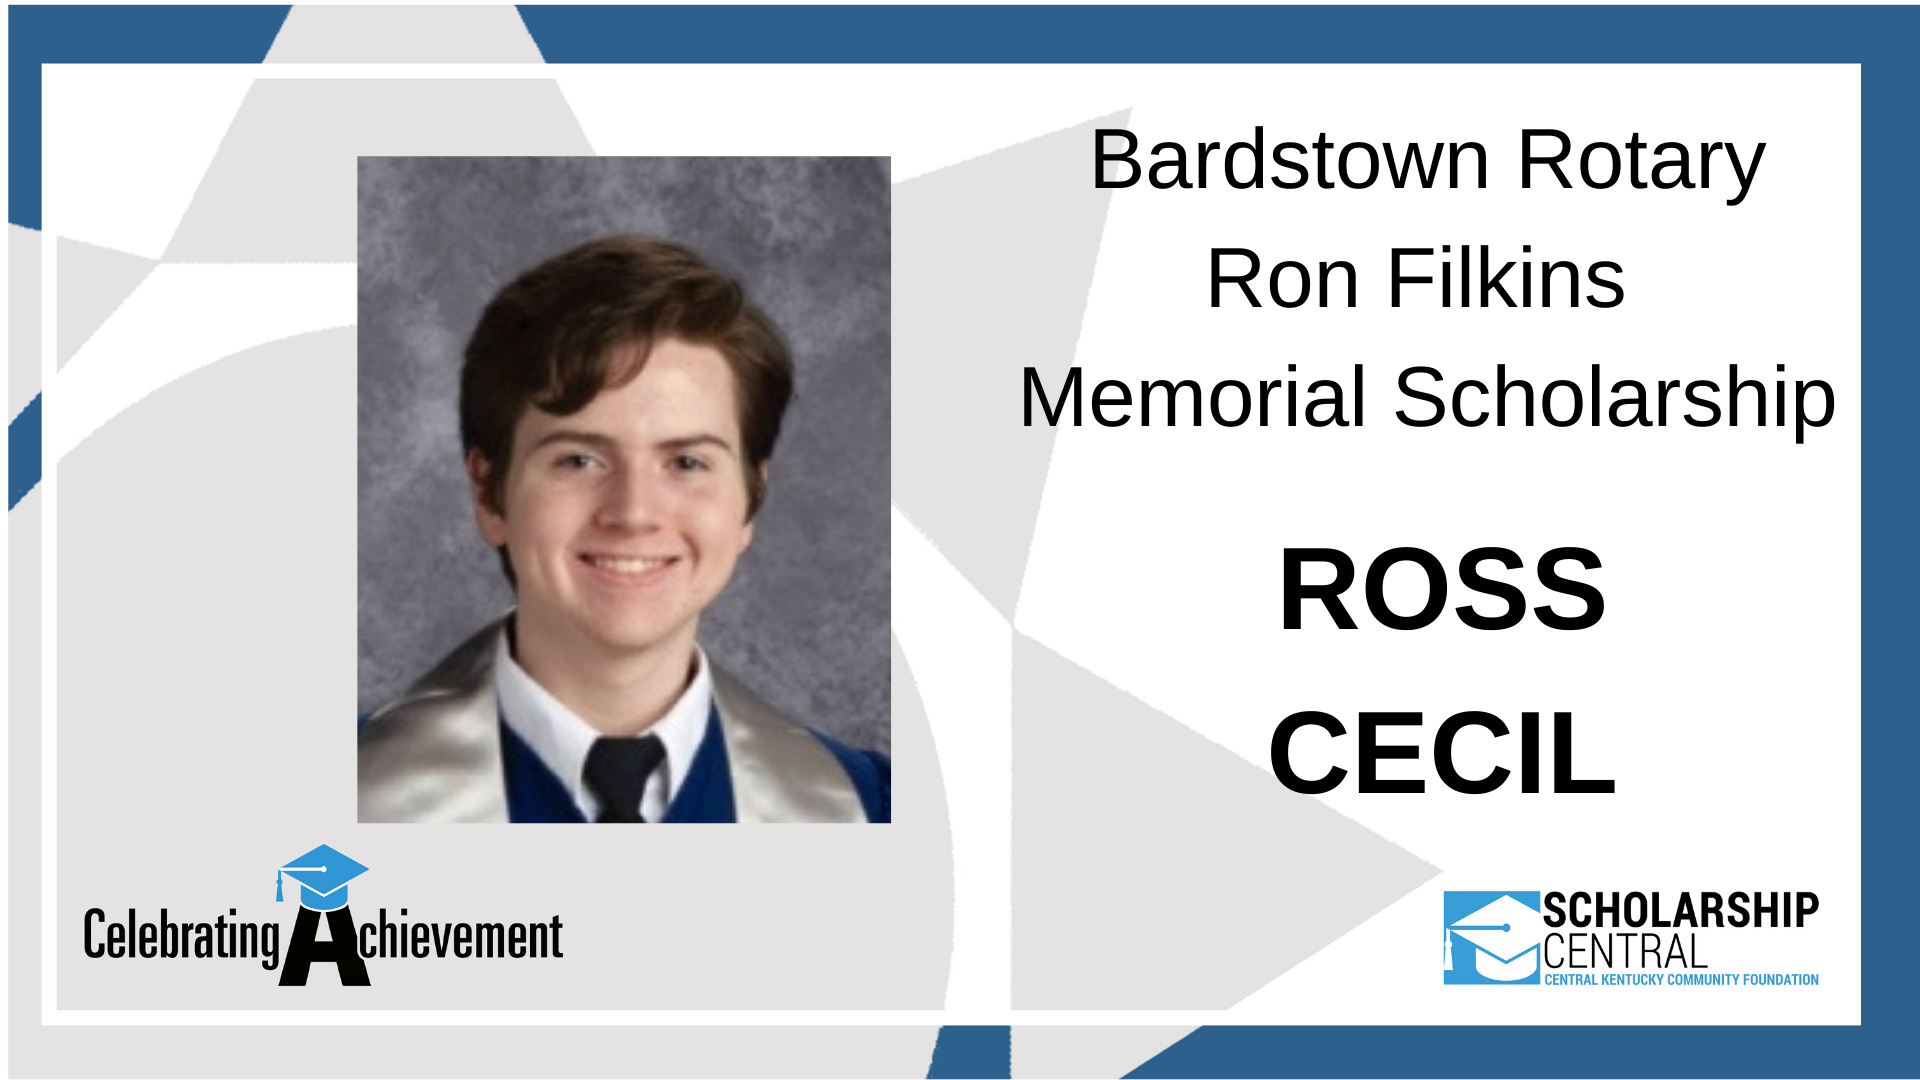 Bardstown Ron Filkins Scholarship